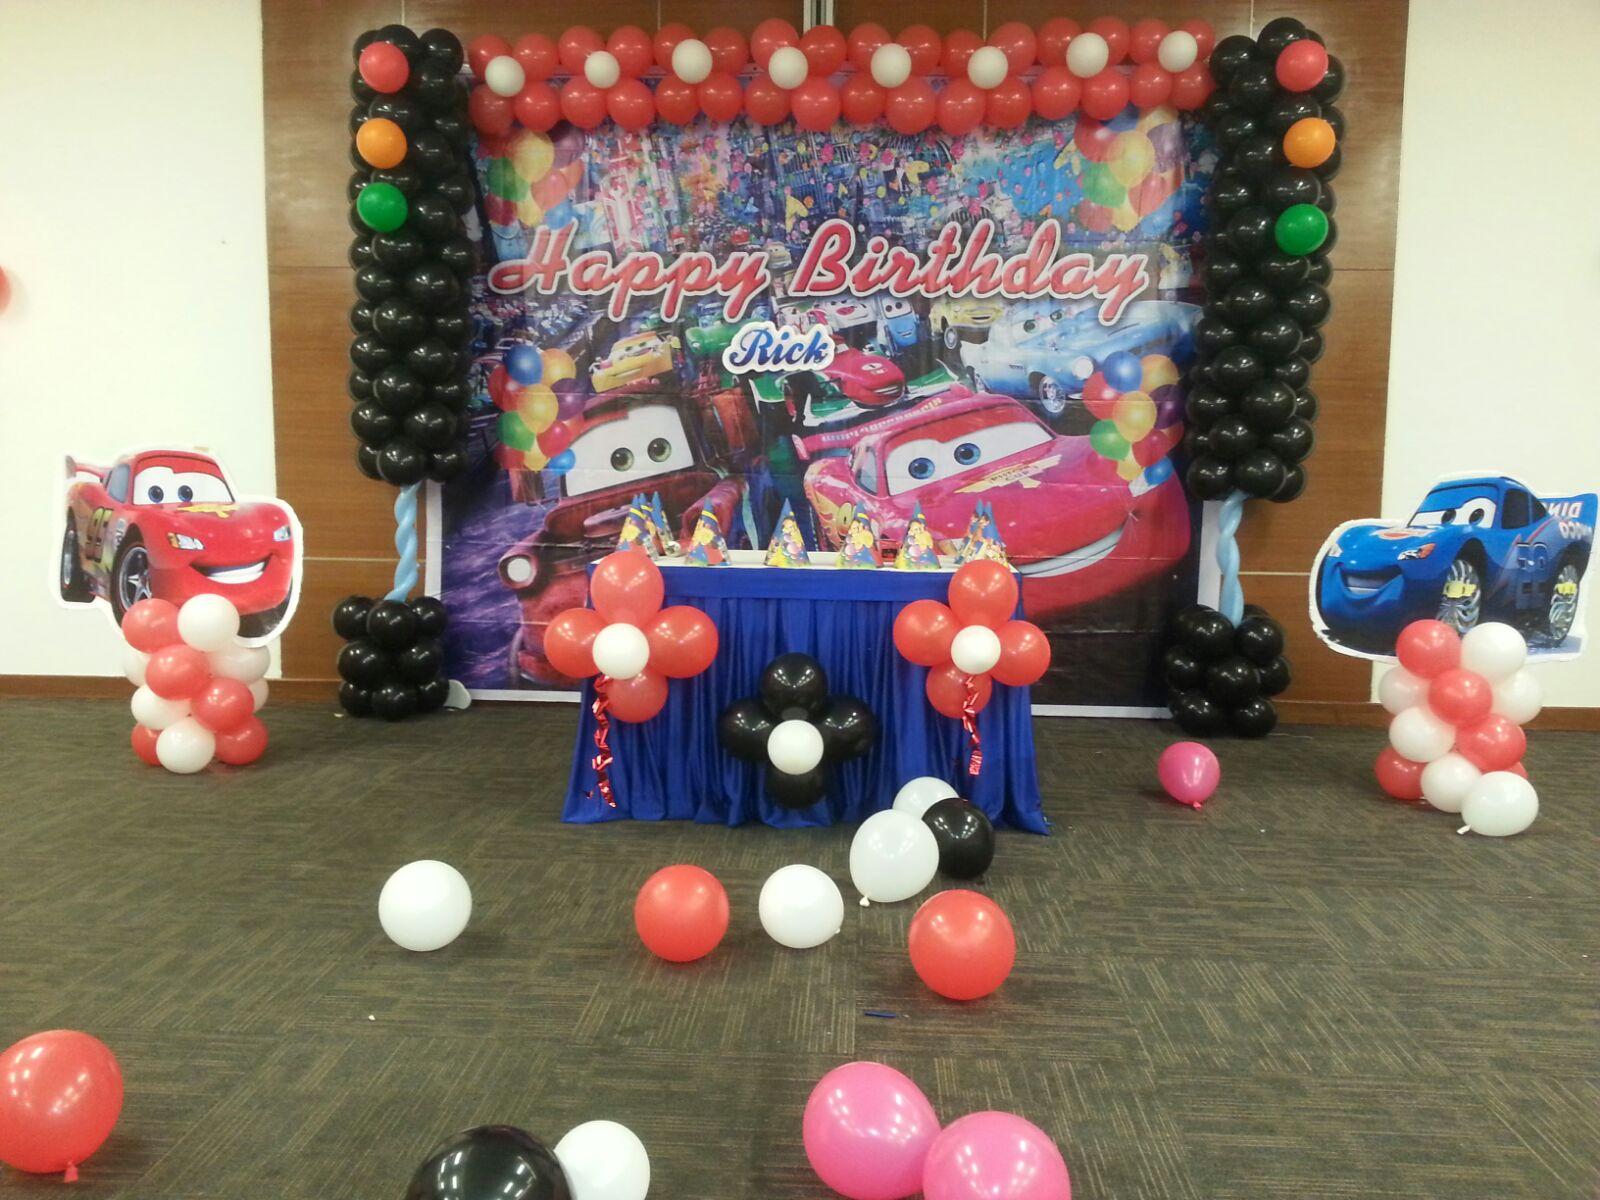 Disney Theme Cake Decorations